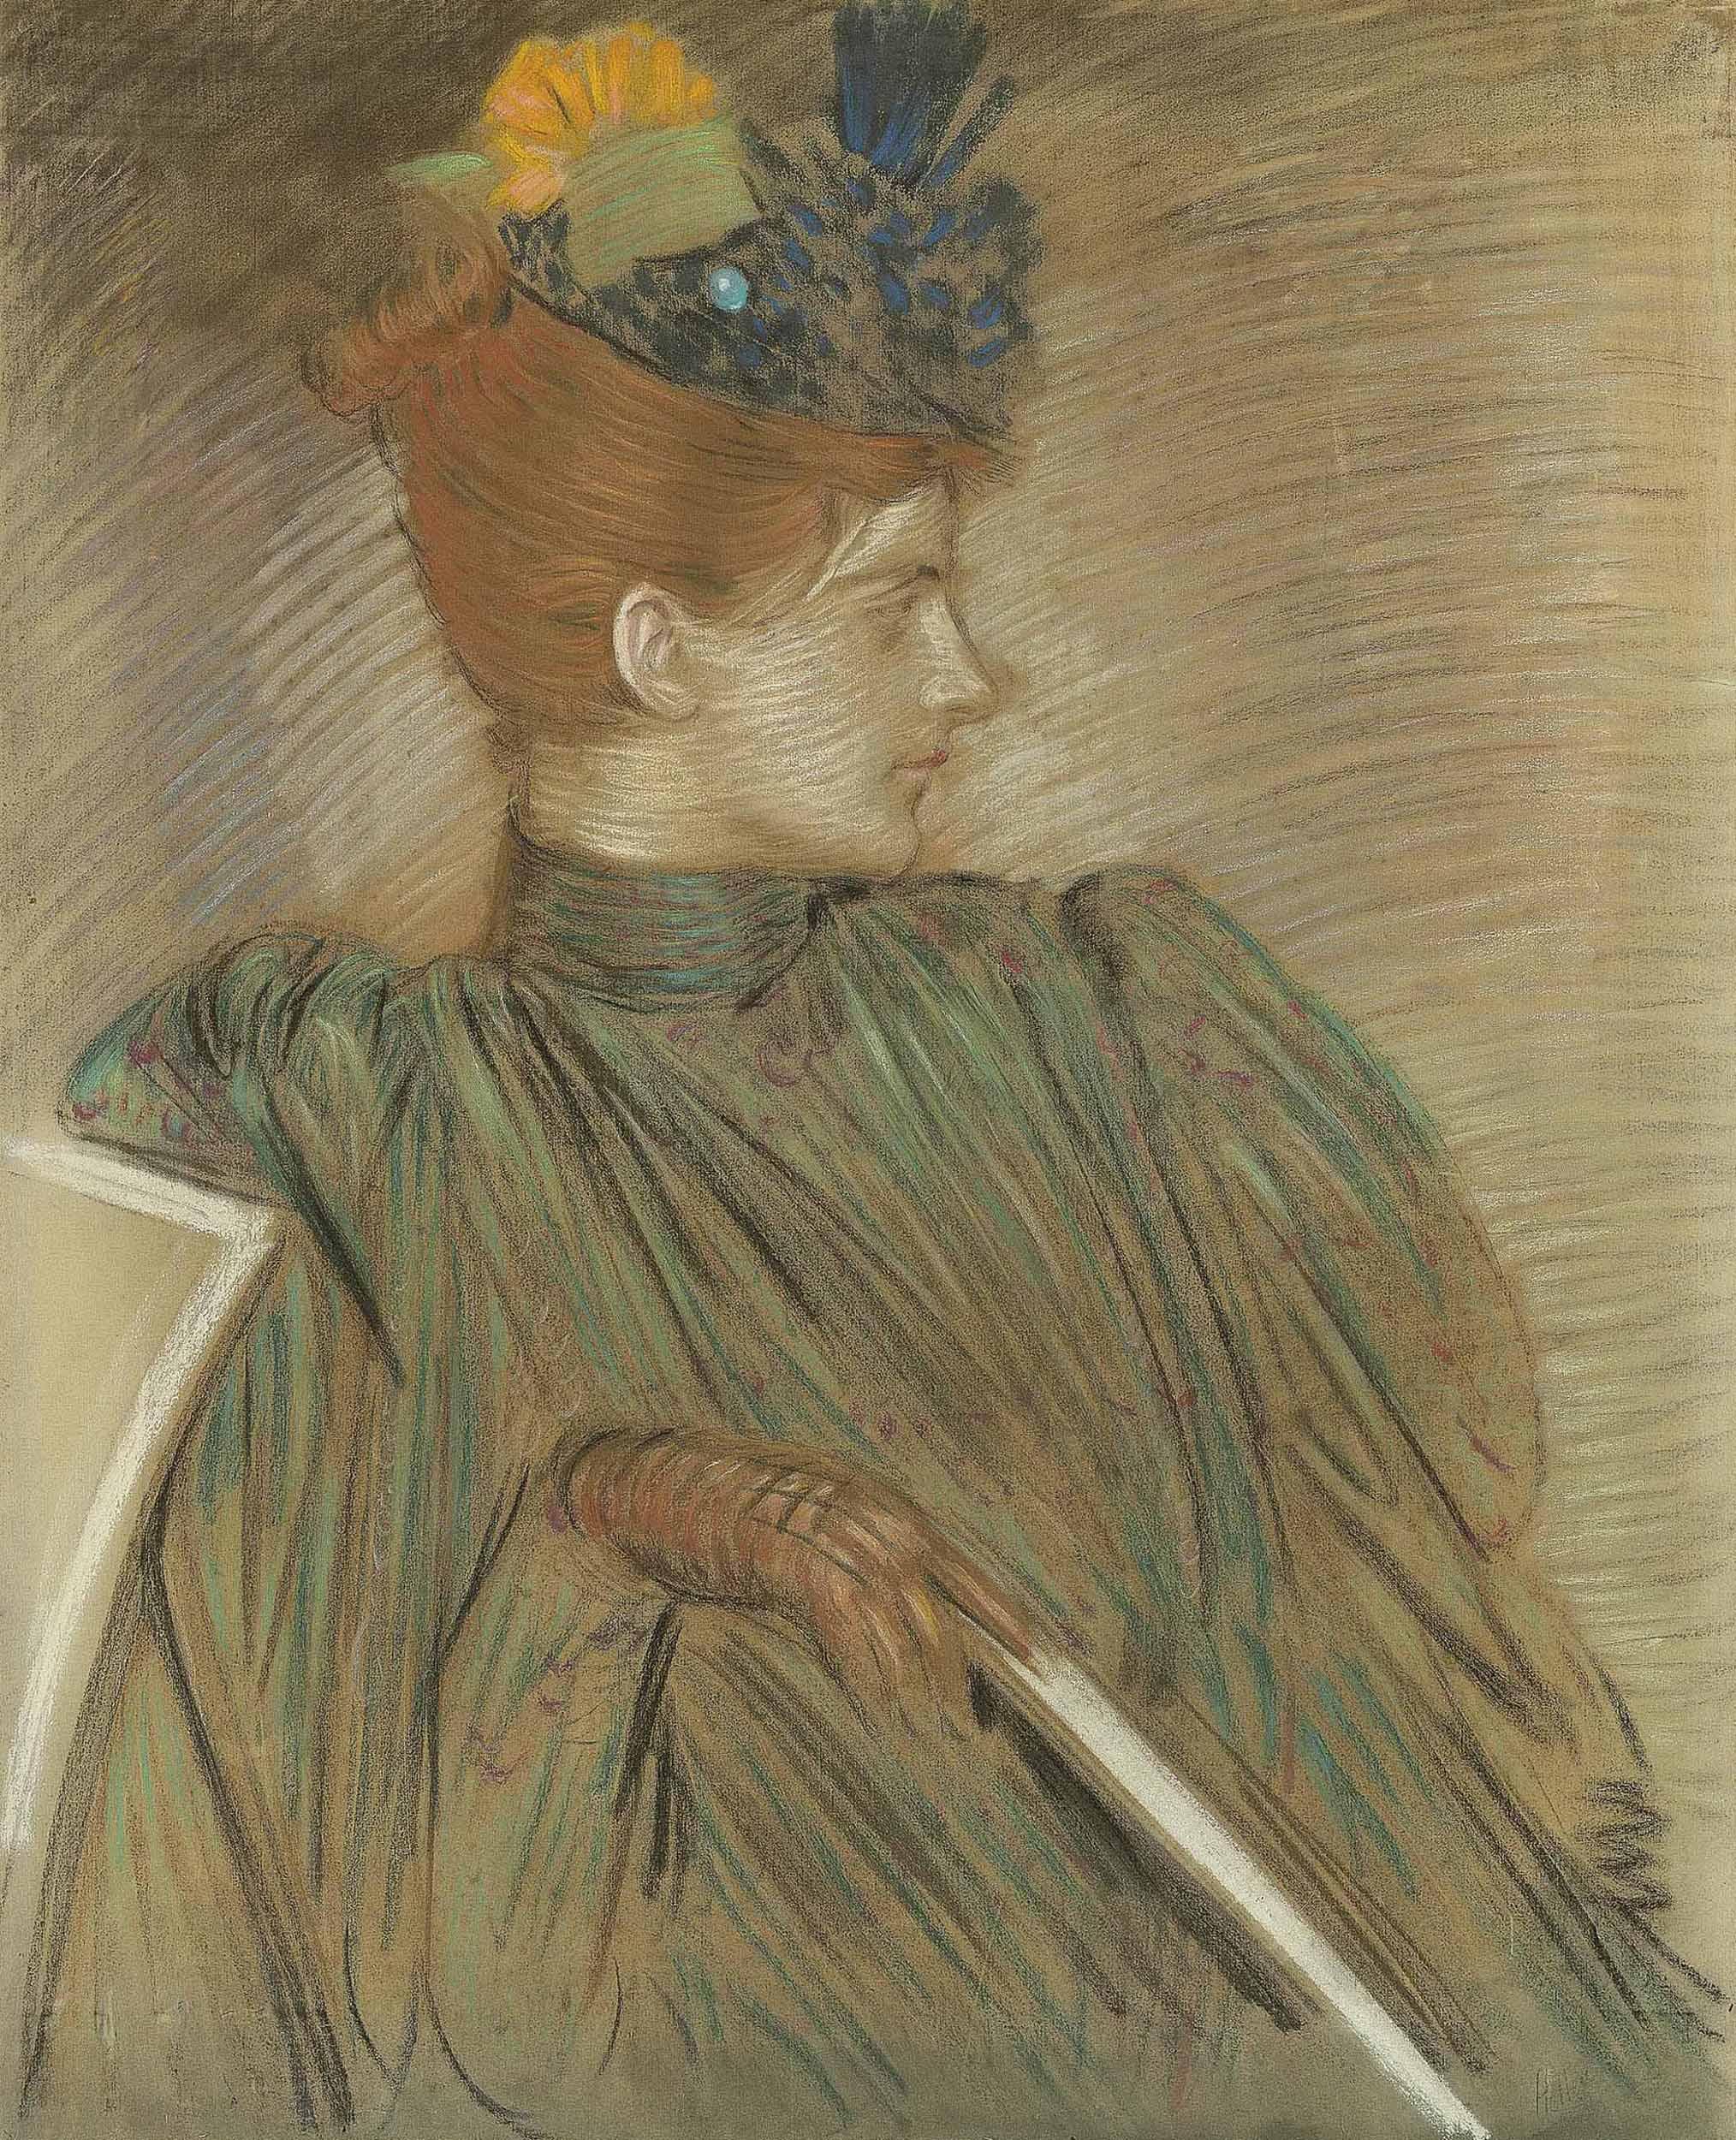 Paul César Helleu (French, 1859-1927)